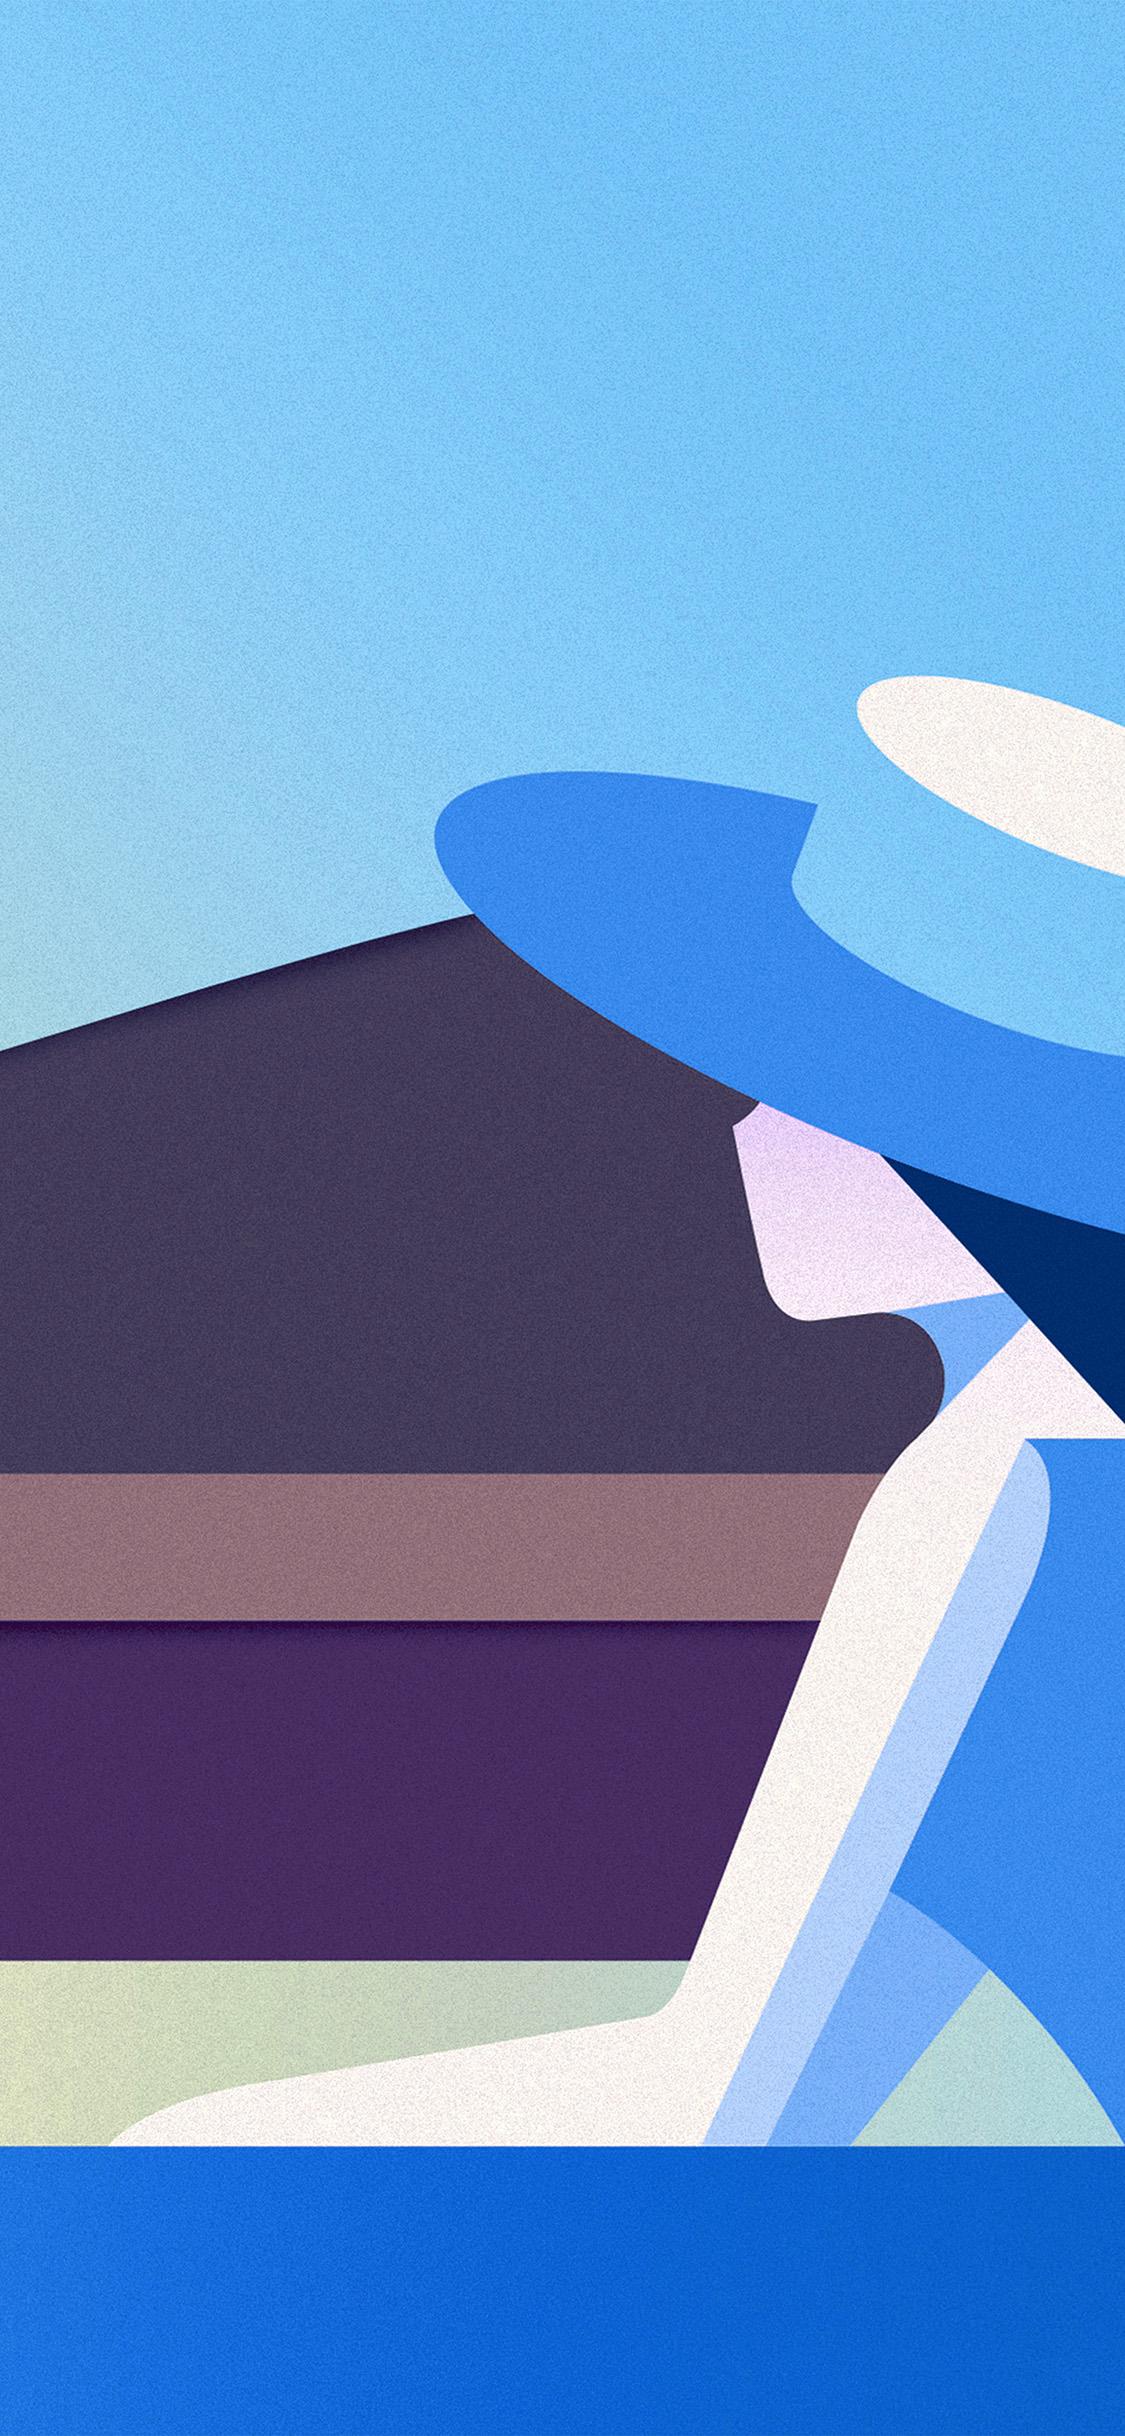 iPhonexpapers.com-Apple-iPhone-wallpaper-bd34-minimal-simple-digital-woman-art-illustration-blue